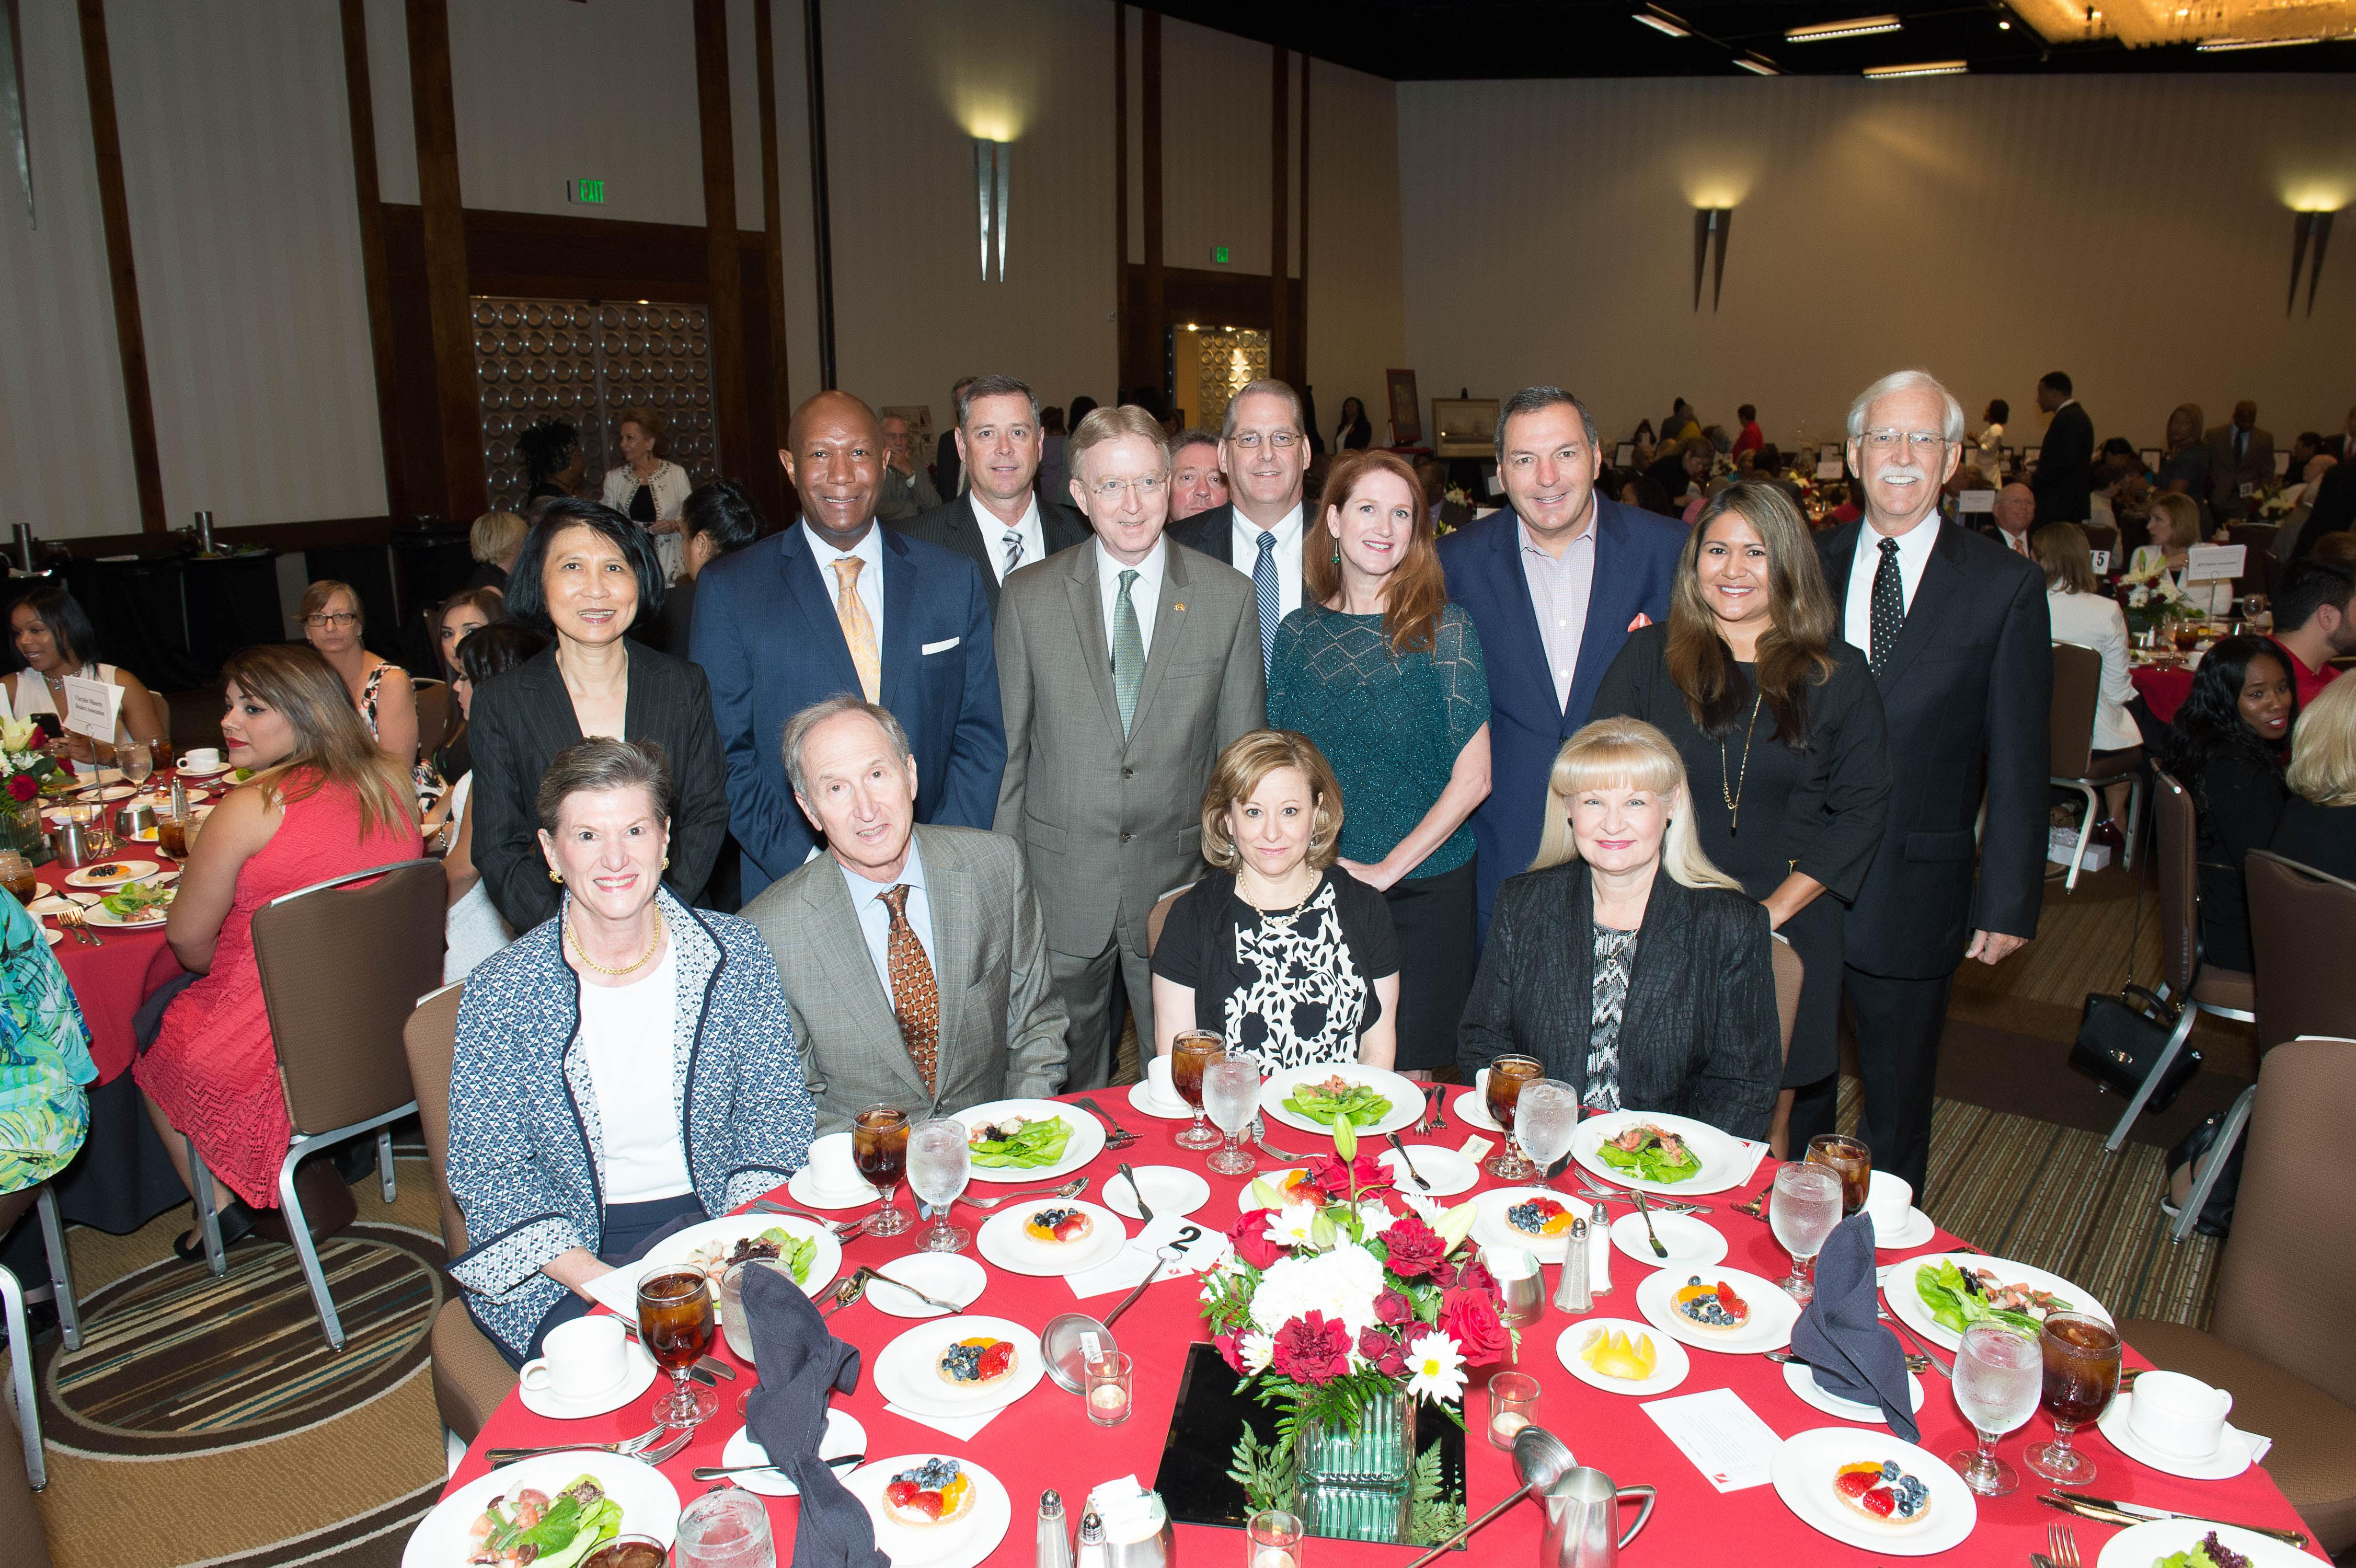 21st Annual Barrier Breaker Award Luncheon